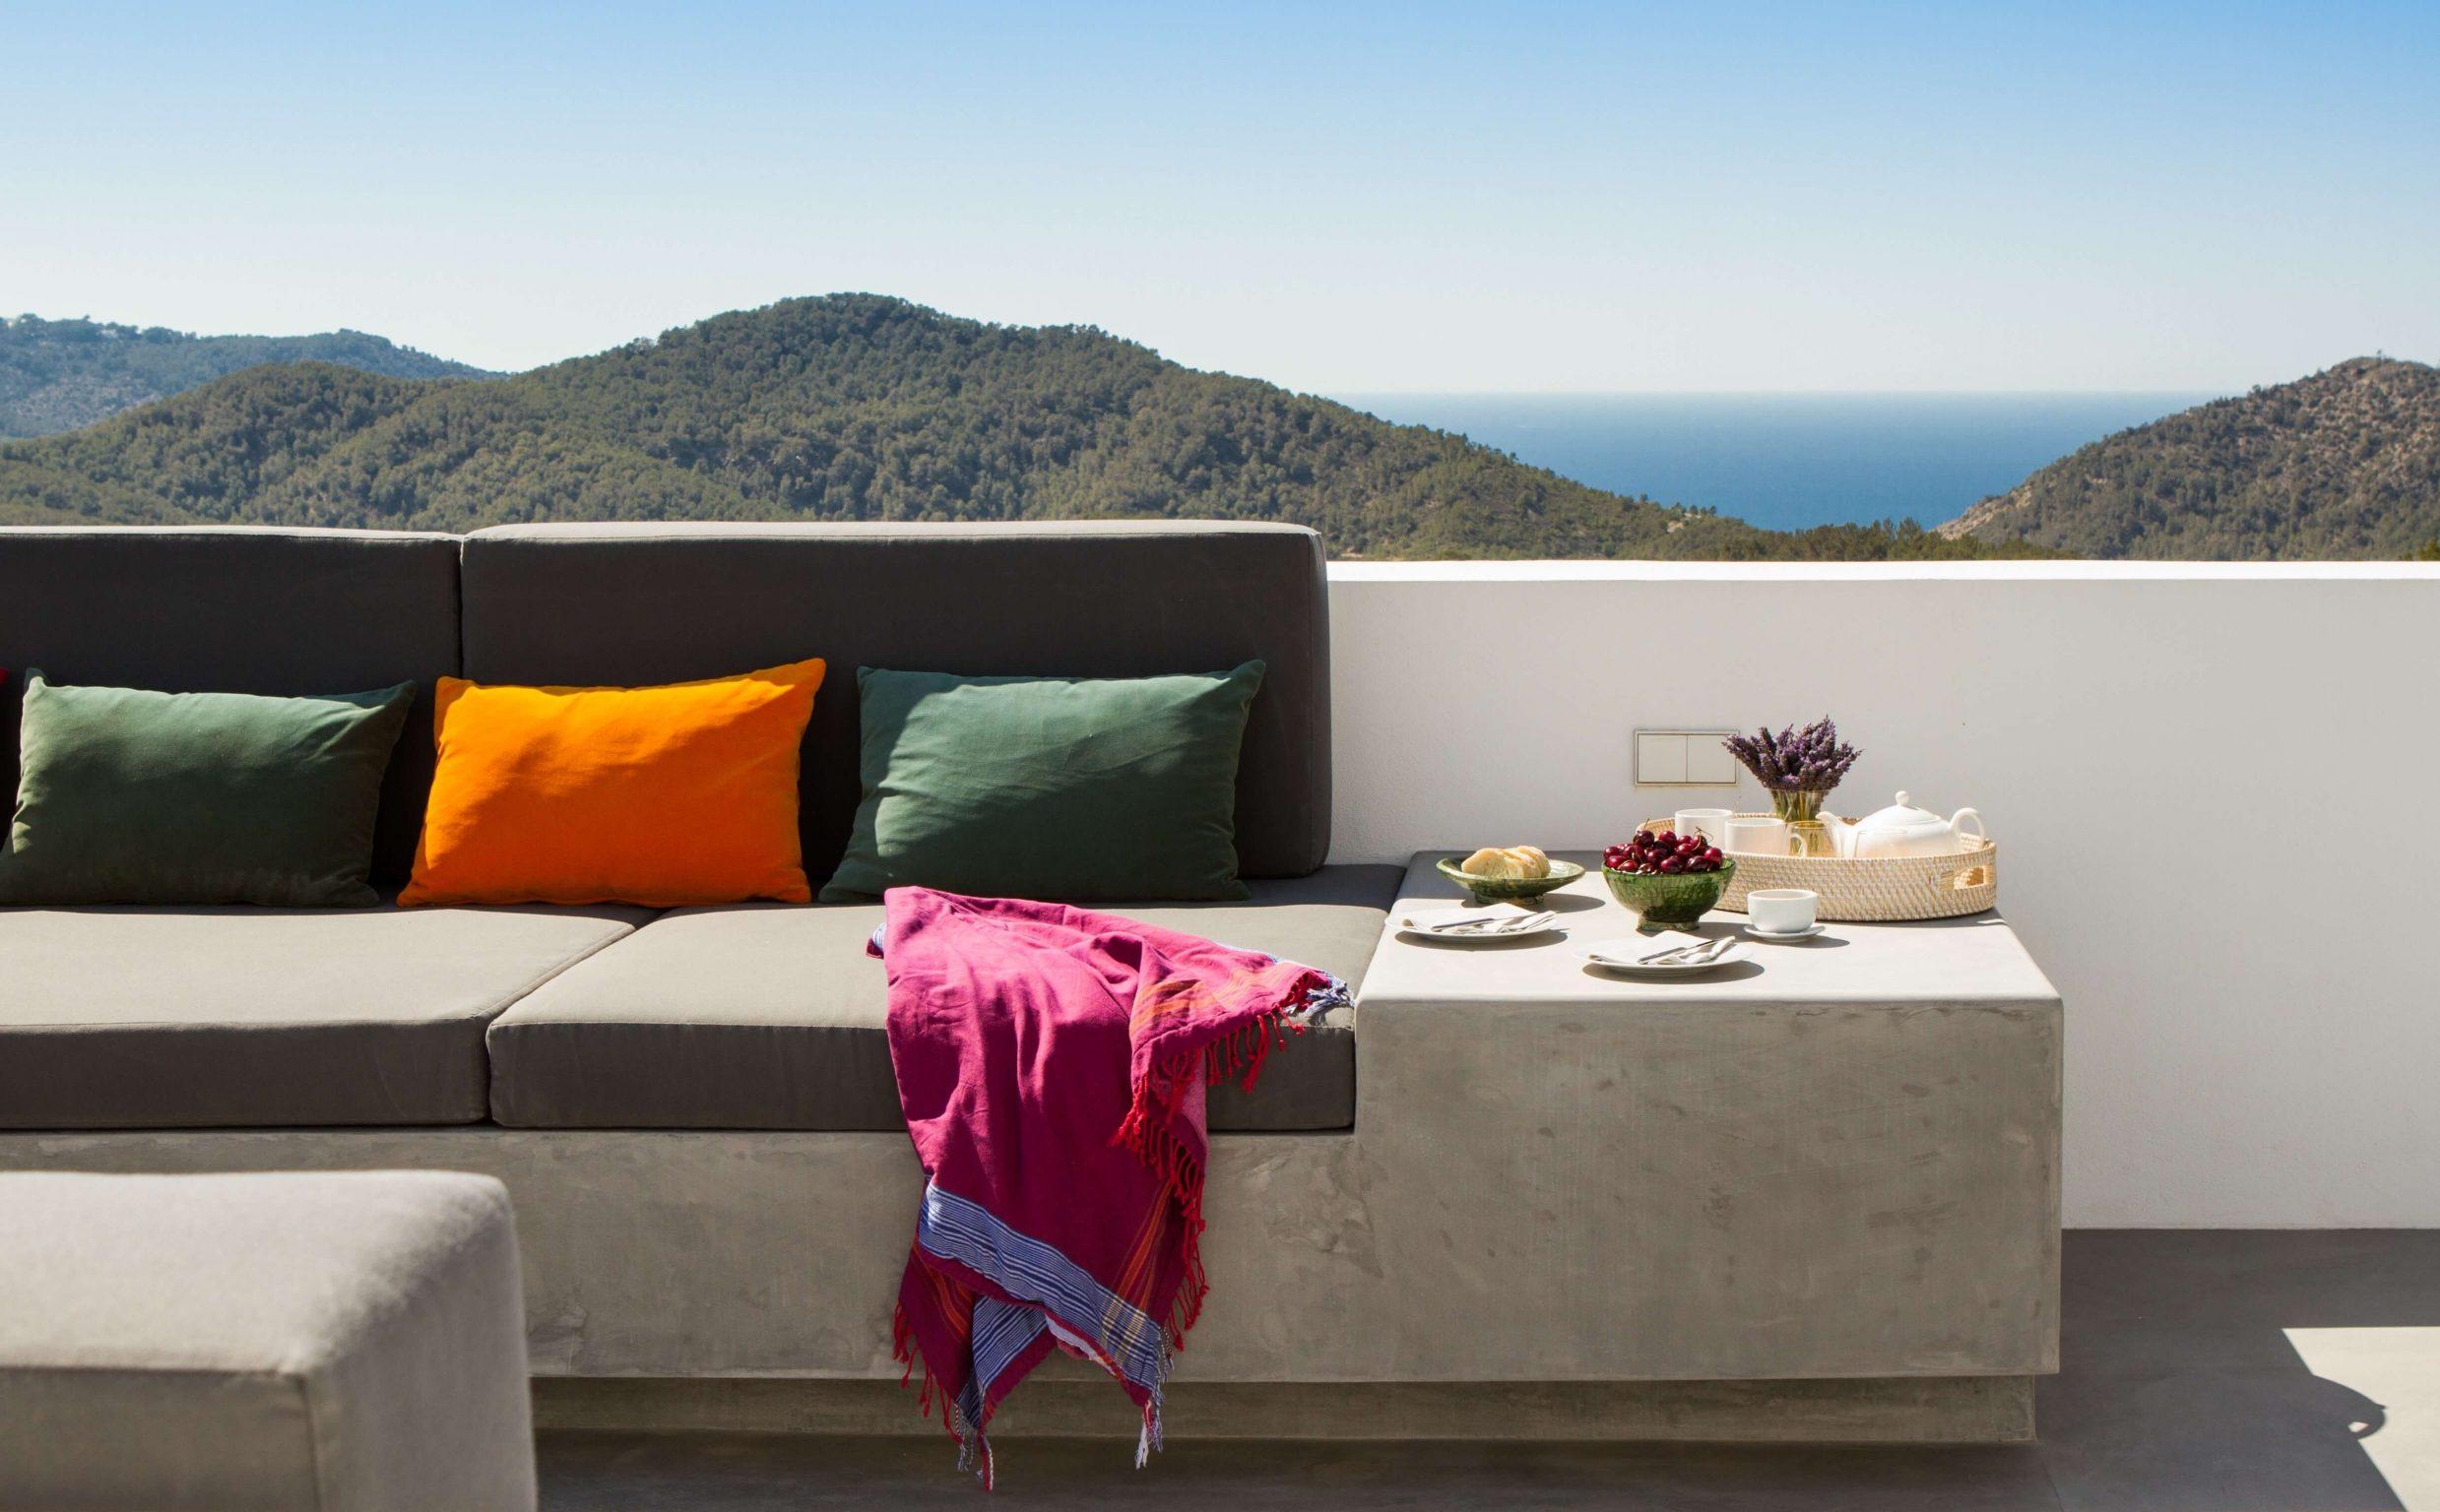 https://www.white-ibiza.com/wp-content/uploads/2020/05/white-ibiza-villas-can-zama-breakfast-on-roof-terrace-2478x1536.jpg